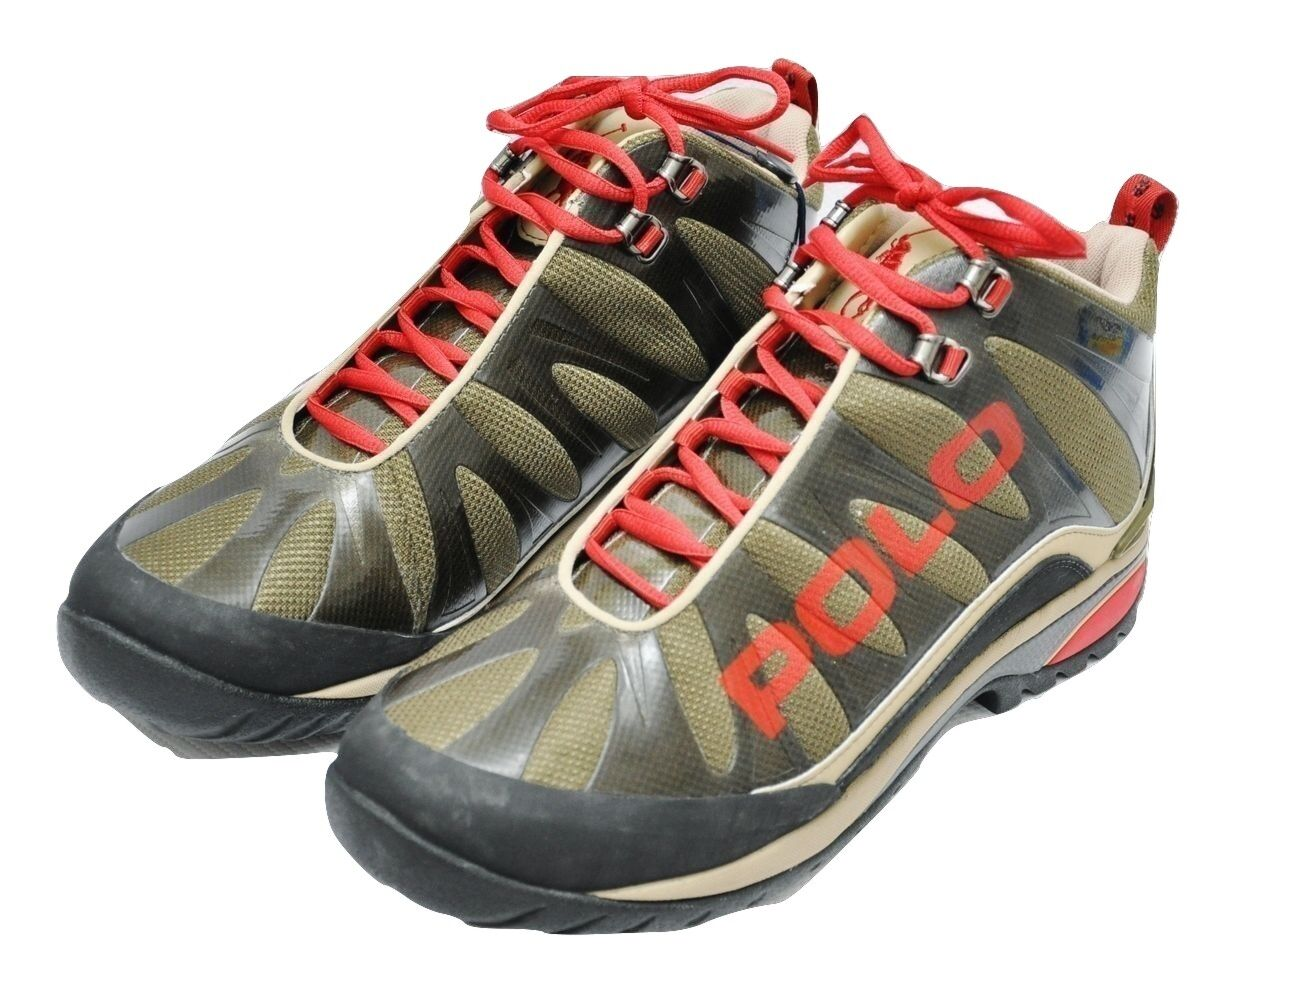 Polo Ralph Lauren SPIELMAN Sneakers Hiking Boots Olive 8.5 149